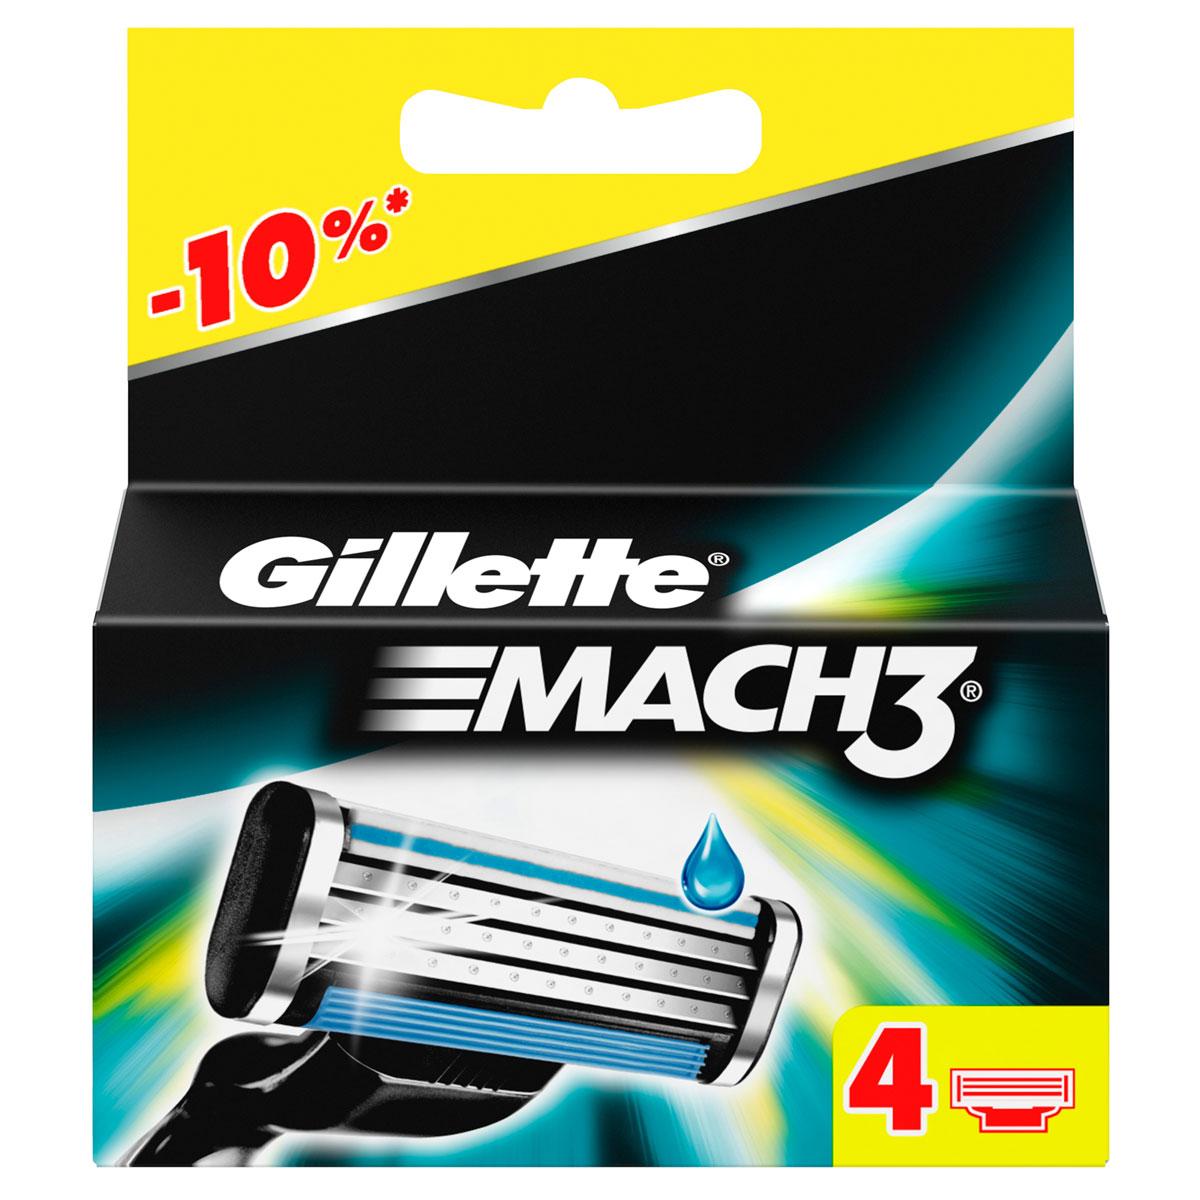 Сменные Кассеты Gillette Mach3 для Мужской Бритвы, 4 шт ( MAG-13284667;MAG-13284667 )